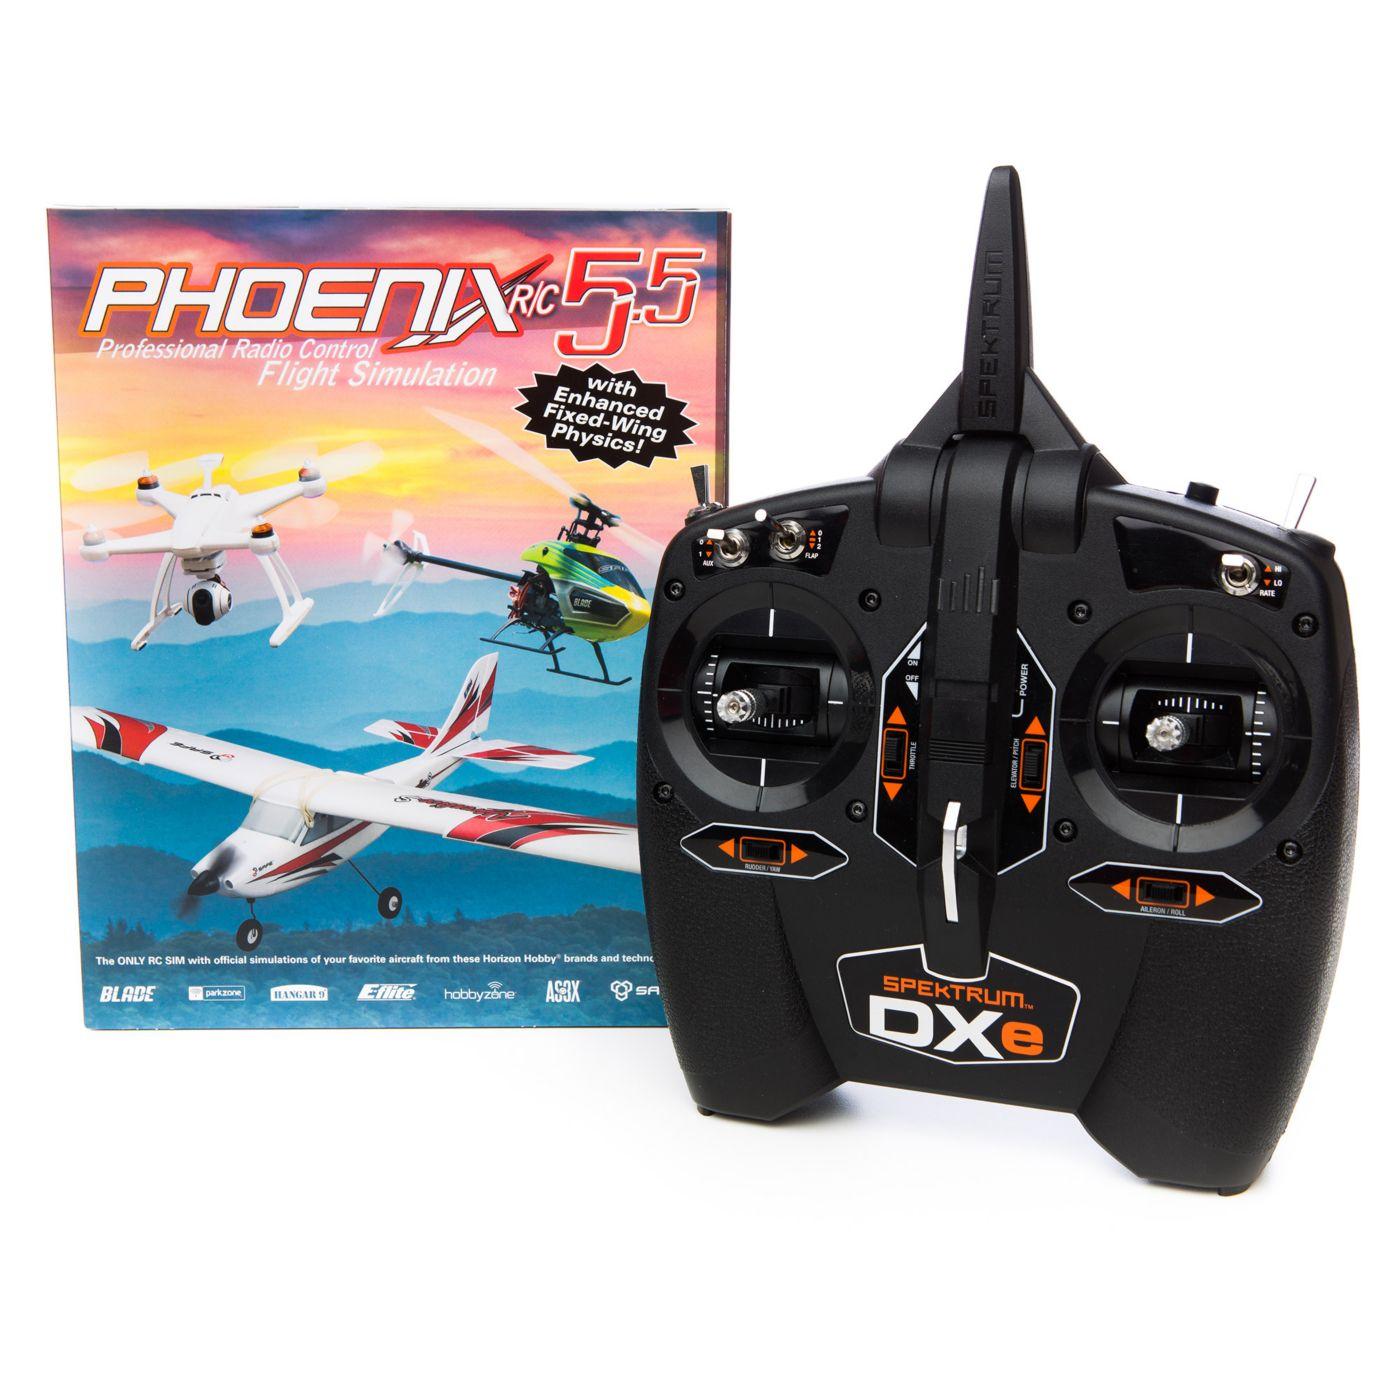 Phoenix Симулятор - Phoenix R/C Pro V5.5 (комплект с DXE)